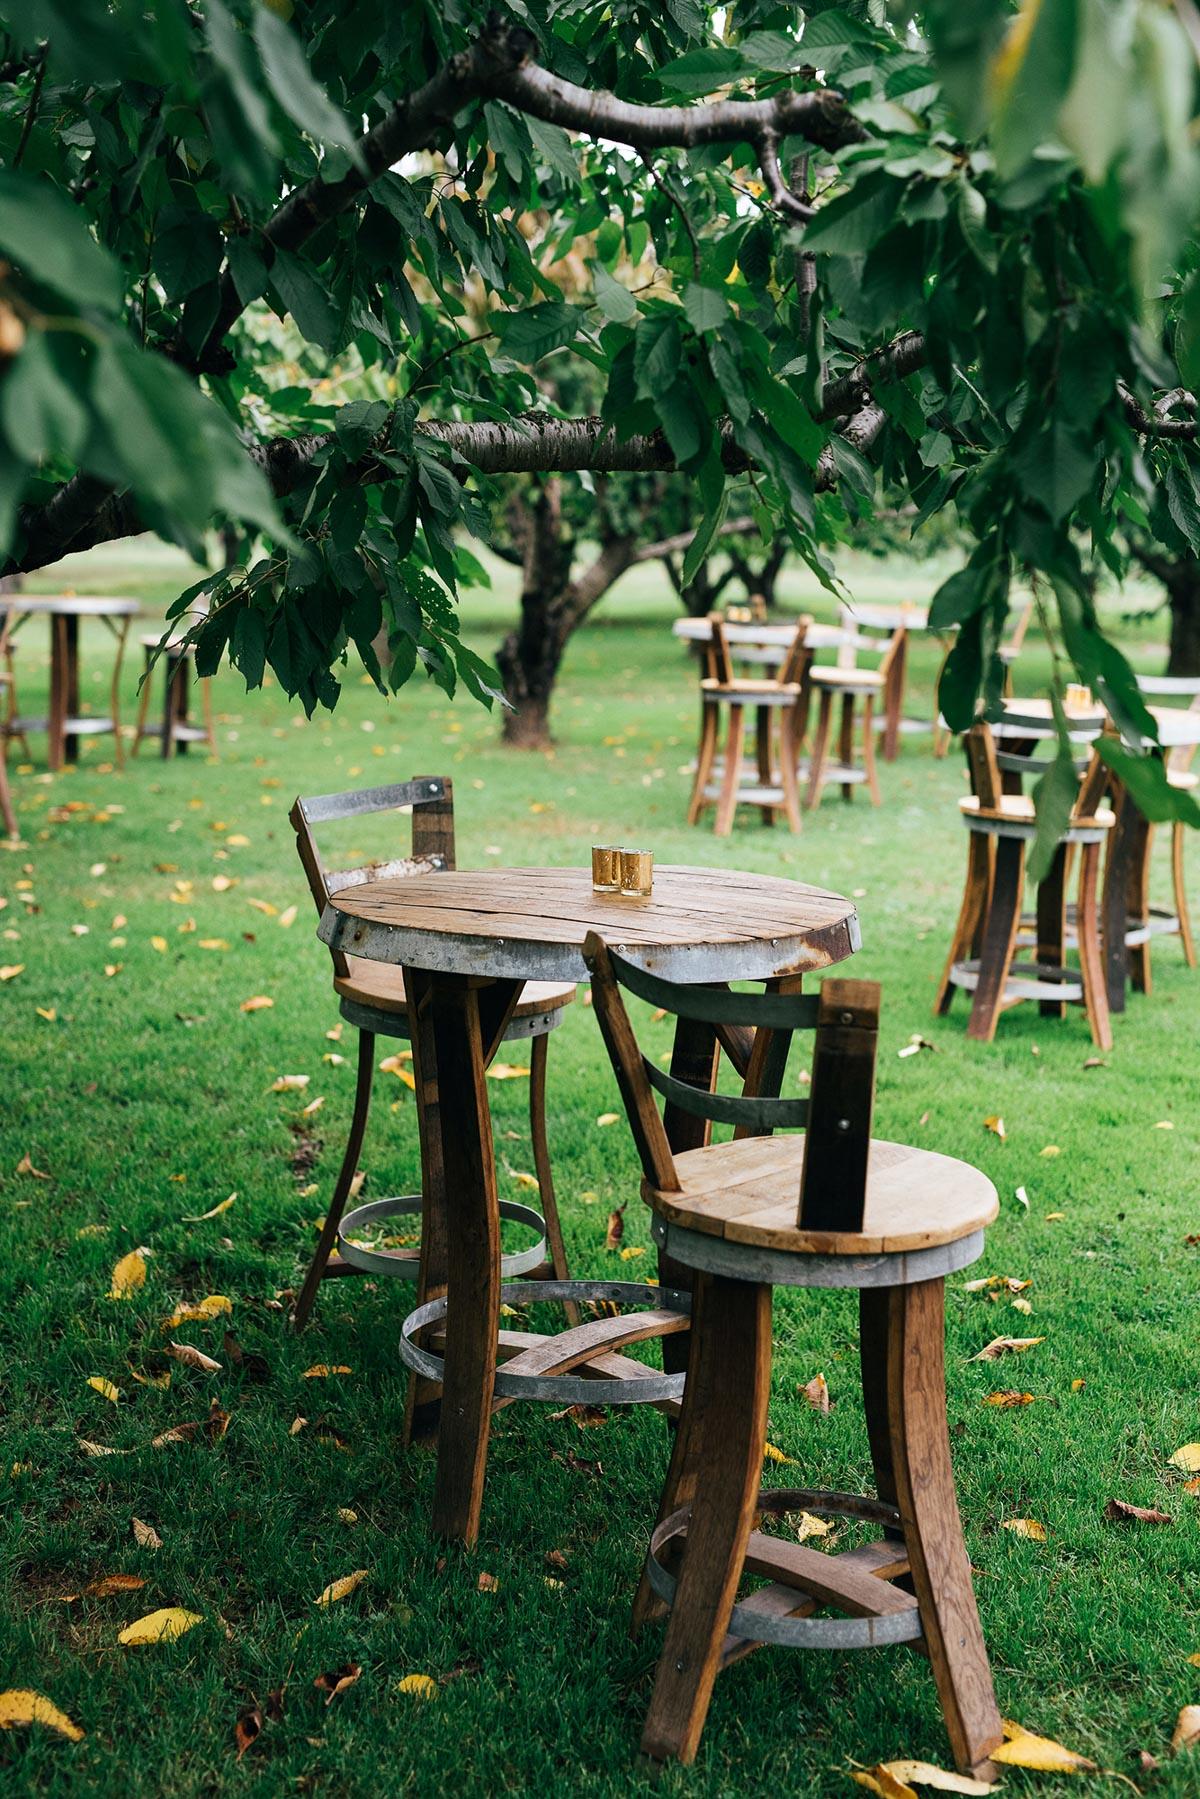 shaw-events-vineyard-bride-swish-list-kurtz-orchards-niagara-on-the-lake-wedding-70.jpg